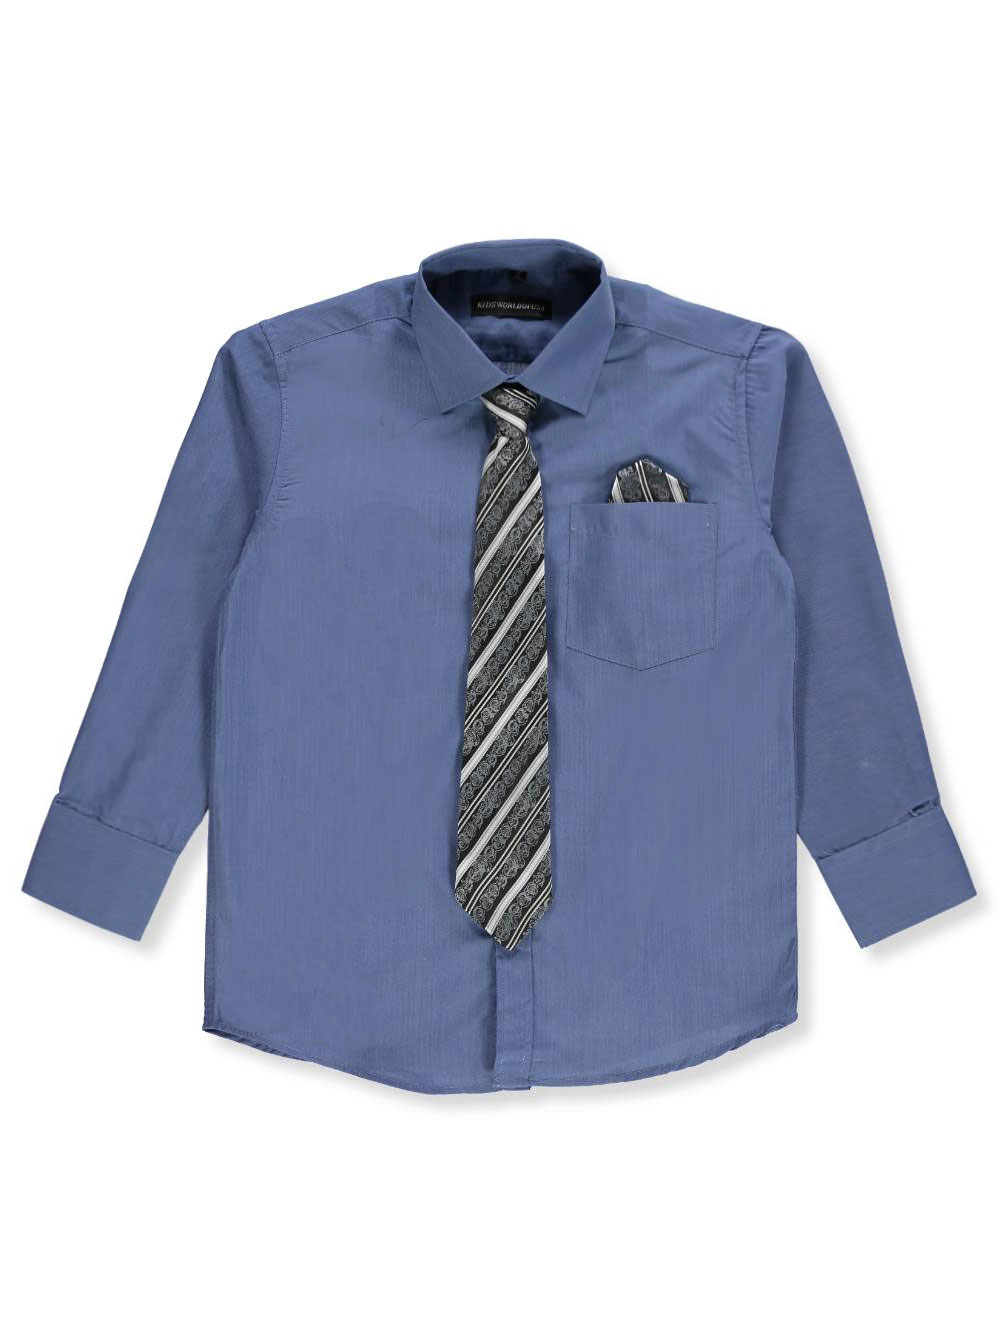 Kids World Boys/' Dress Shirt with Accessories